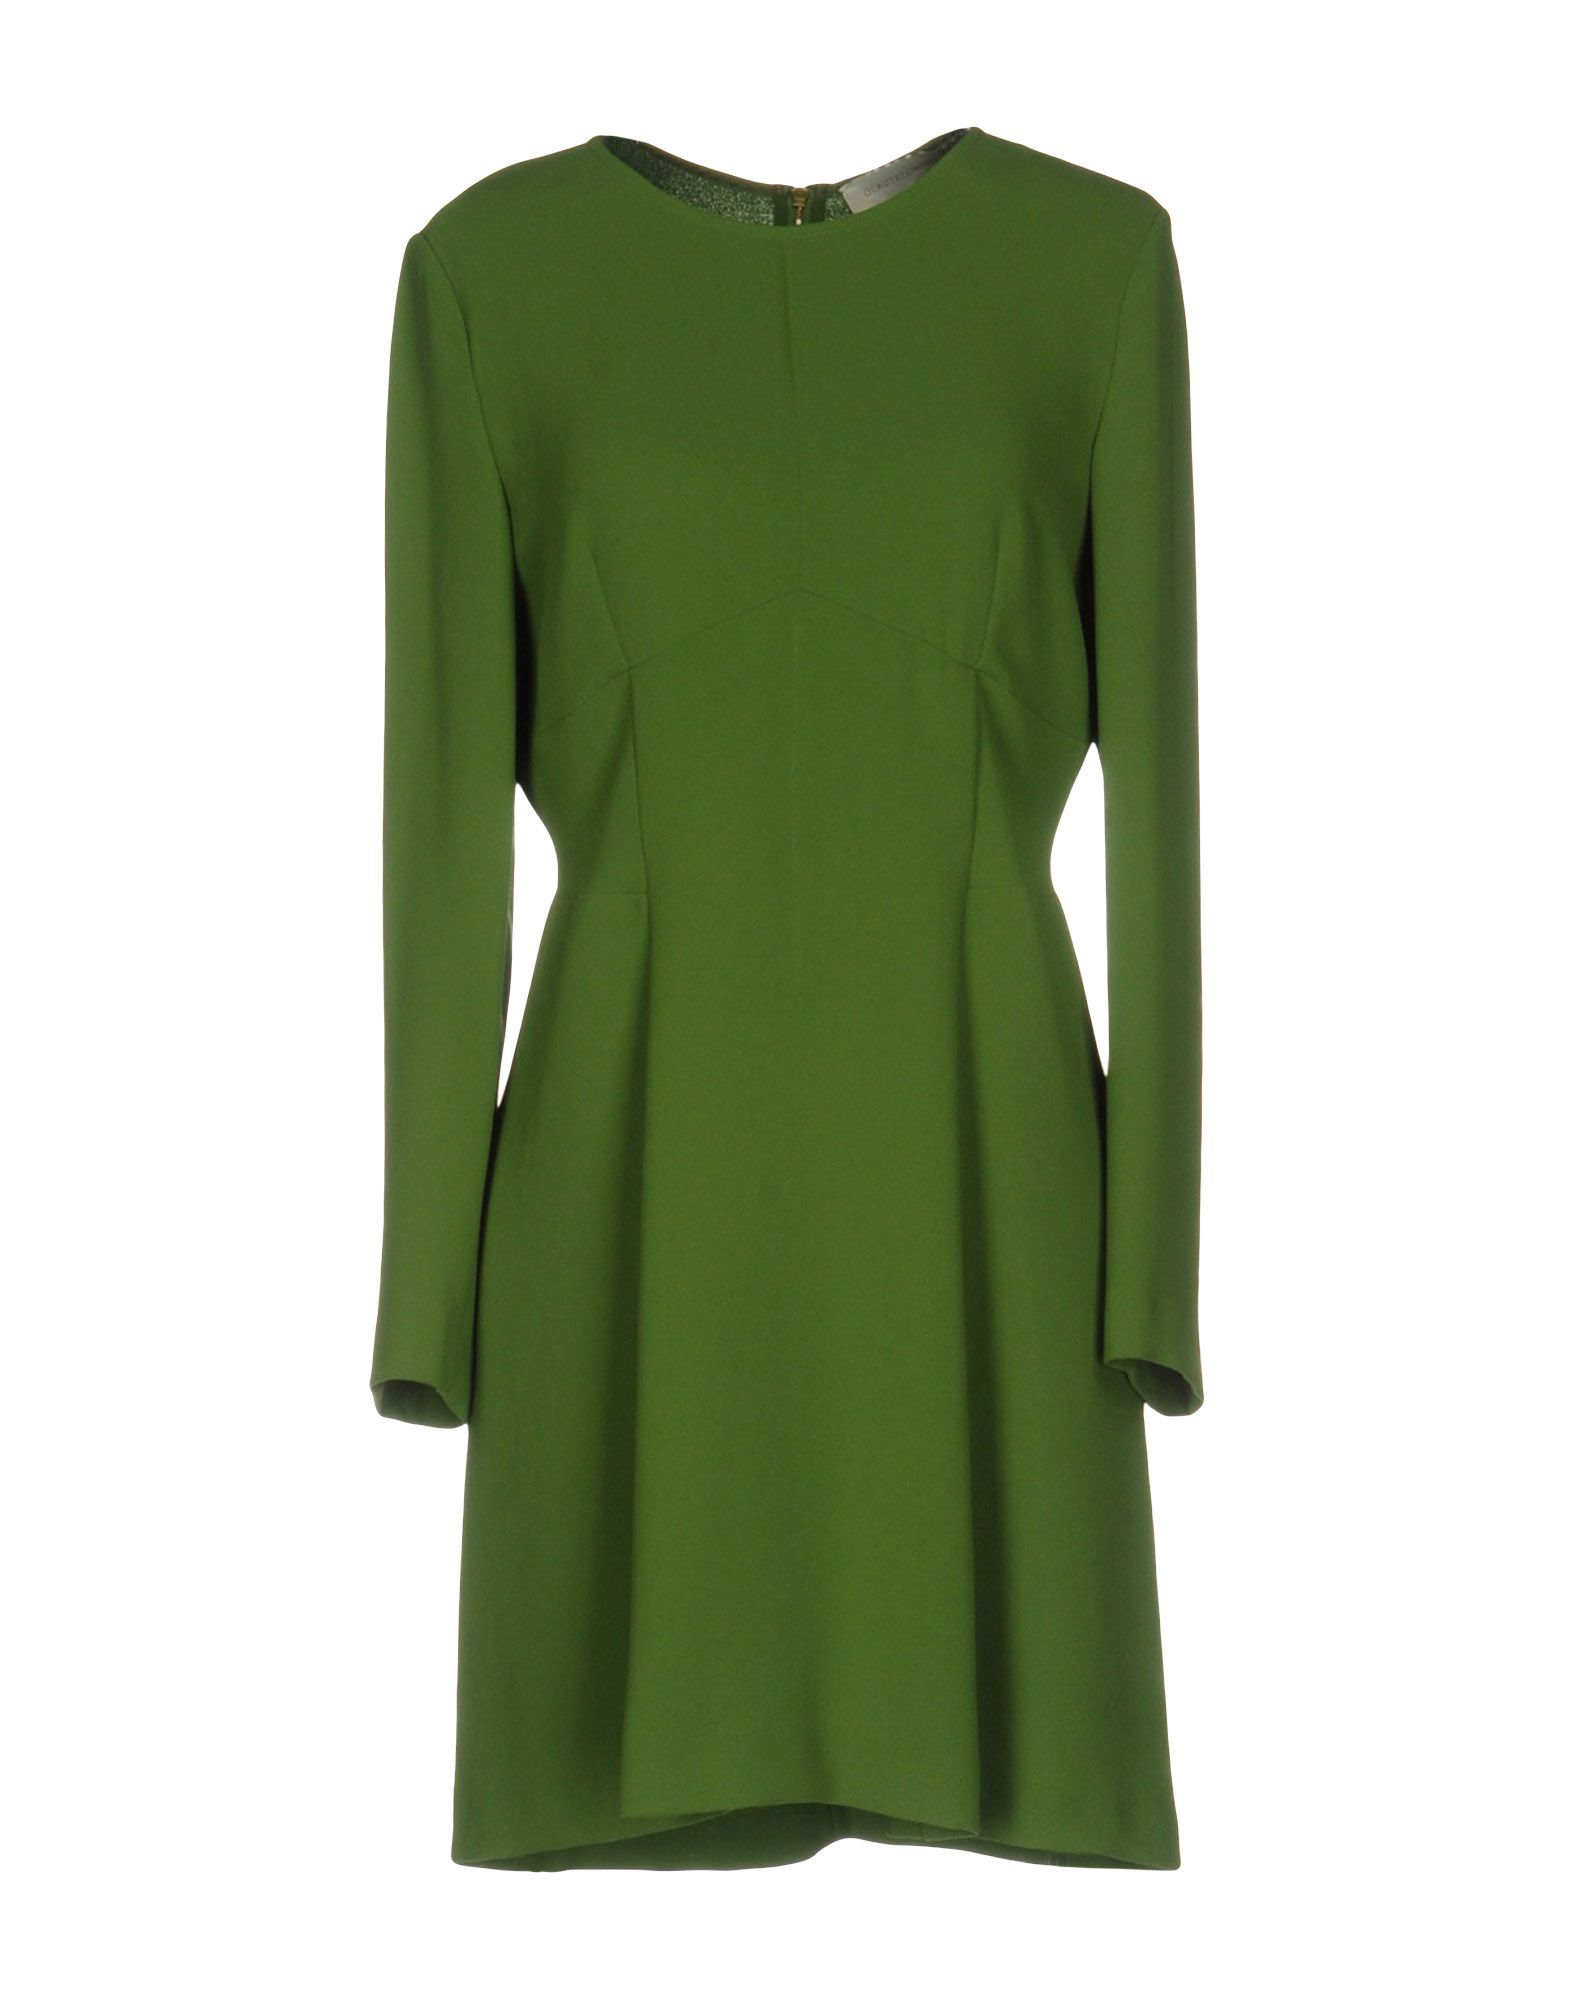 L' Autre Chose Green Long Sleeve Dress